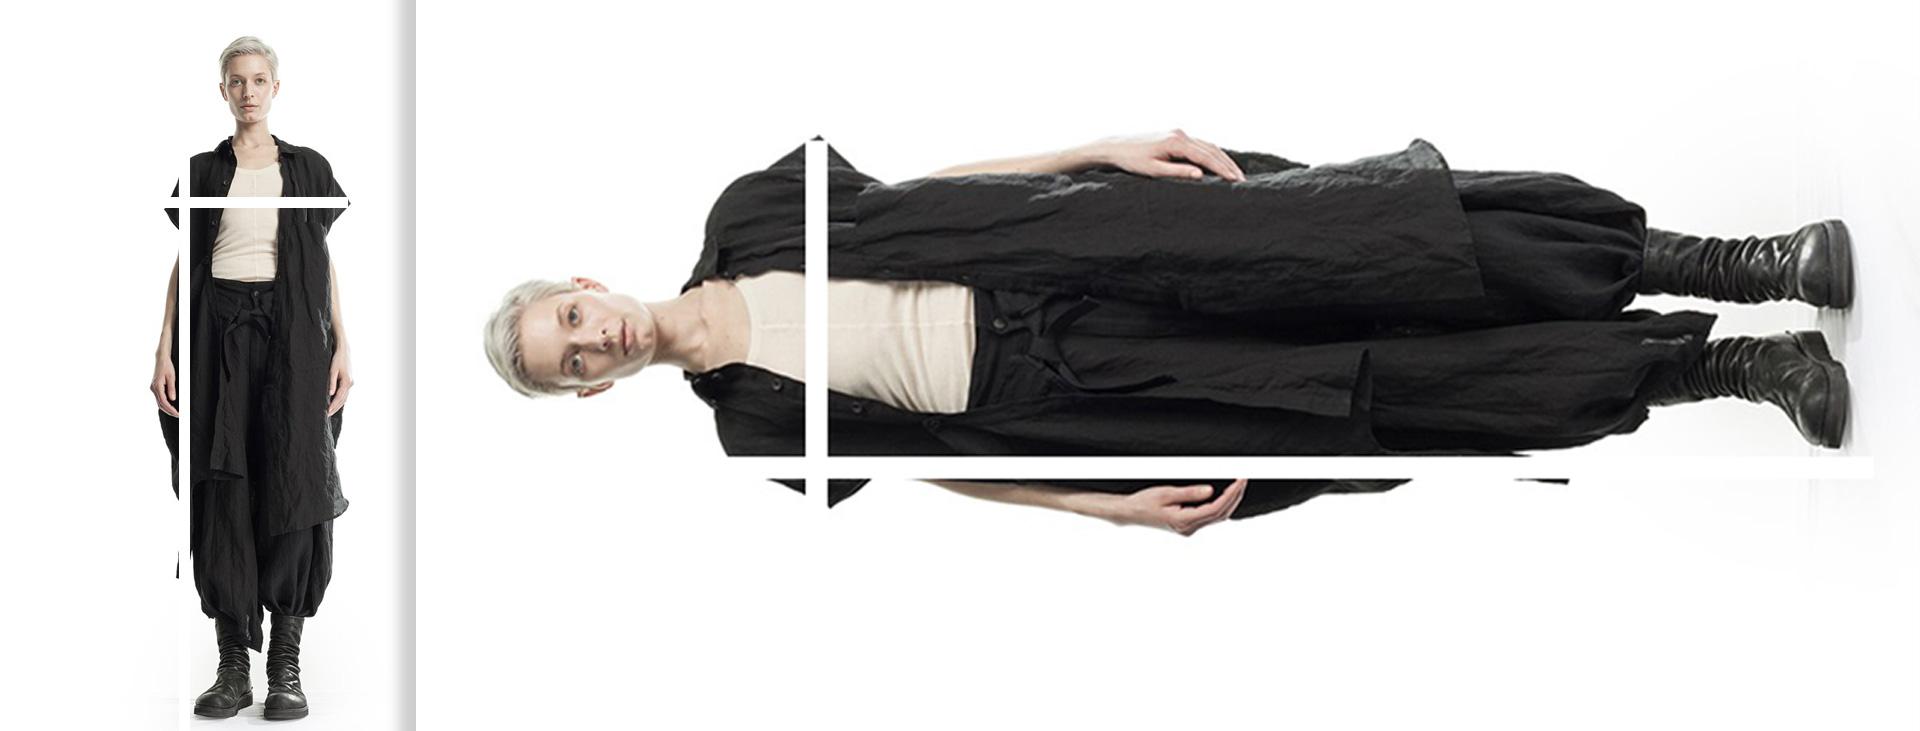 avant garde  women33 1 - استایل آوانگارد زنانه